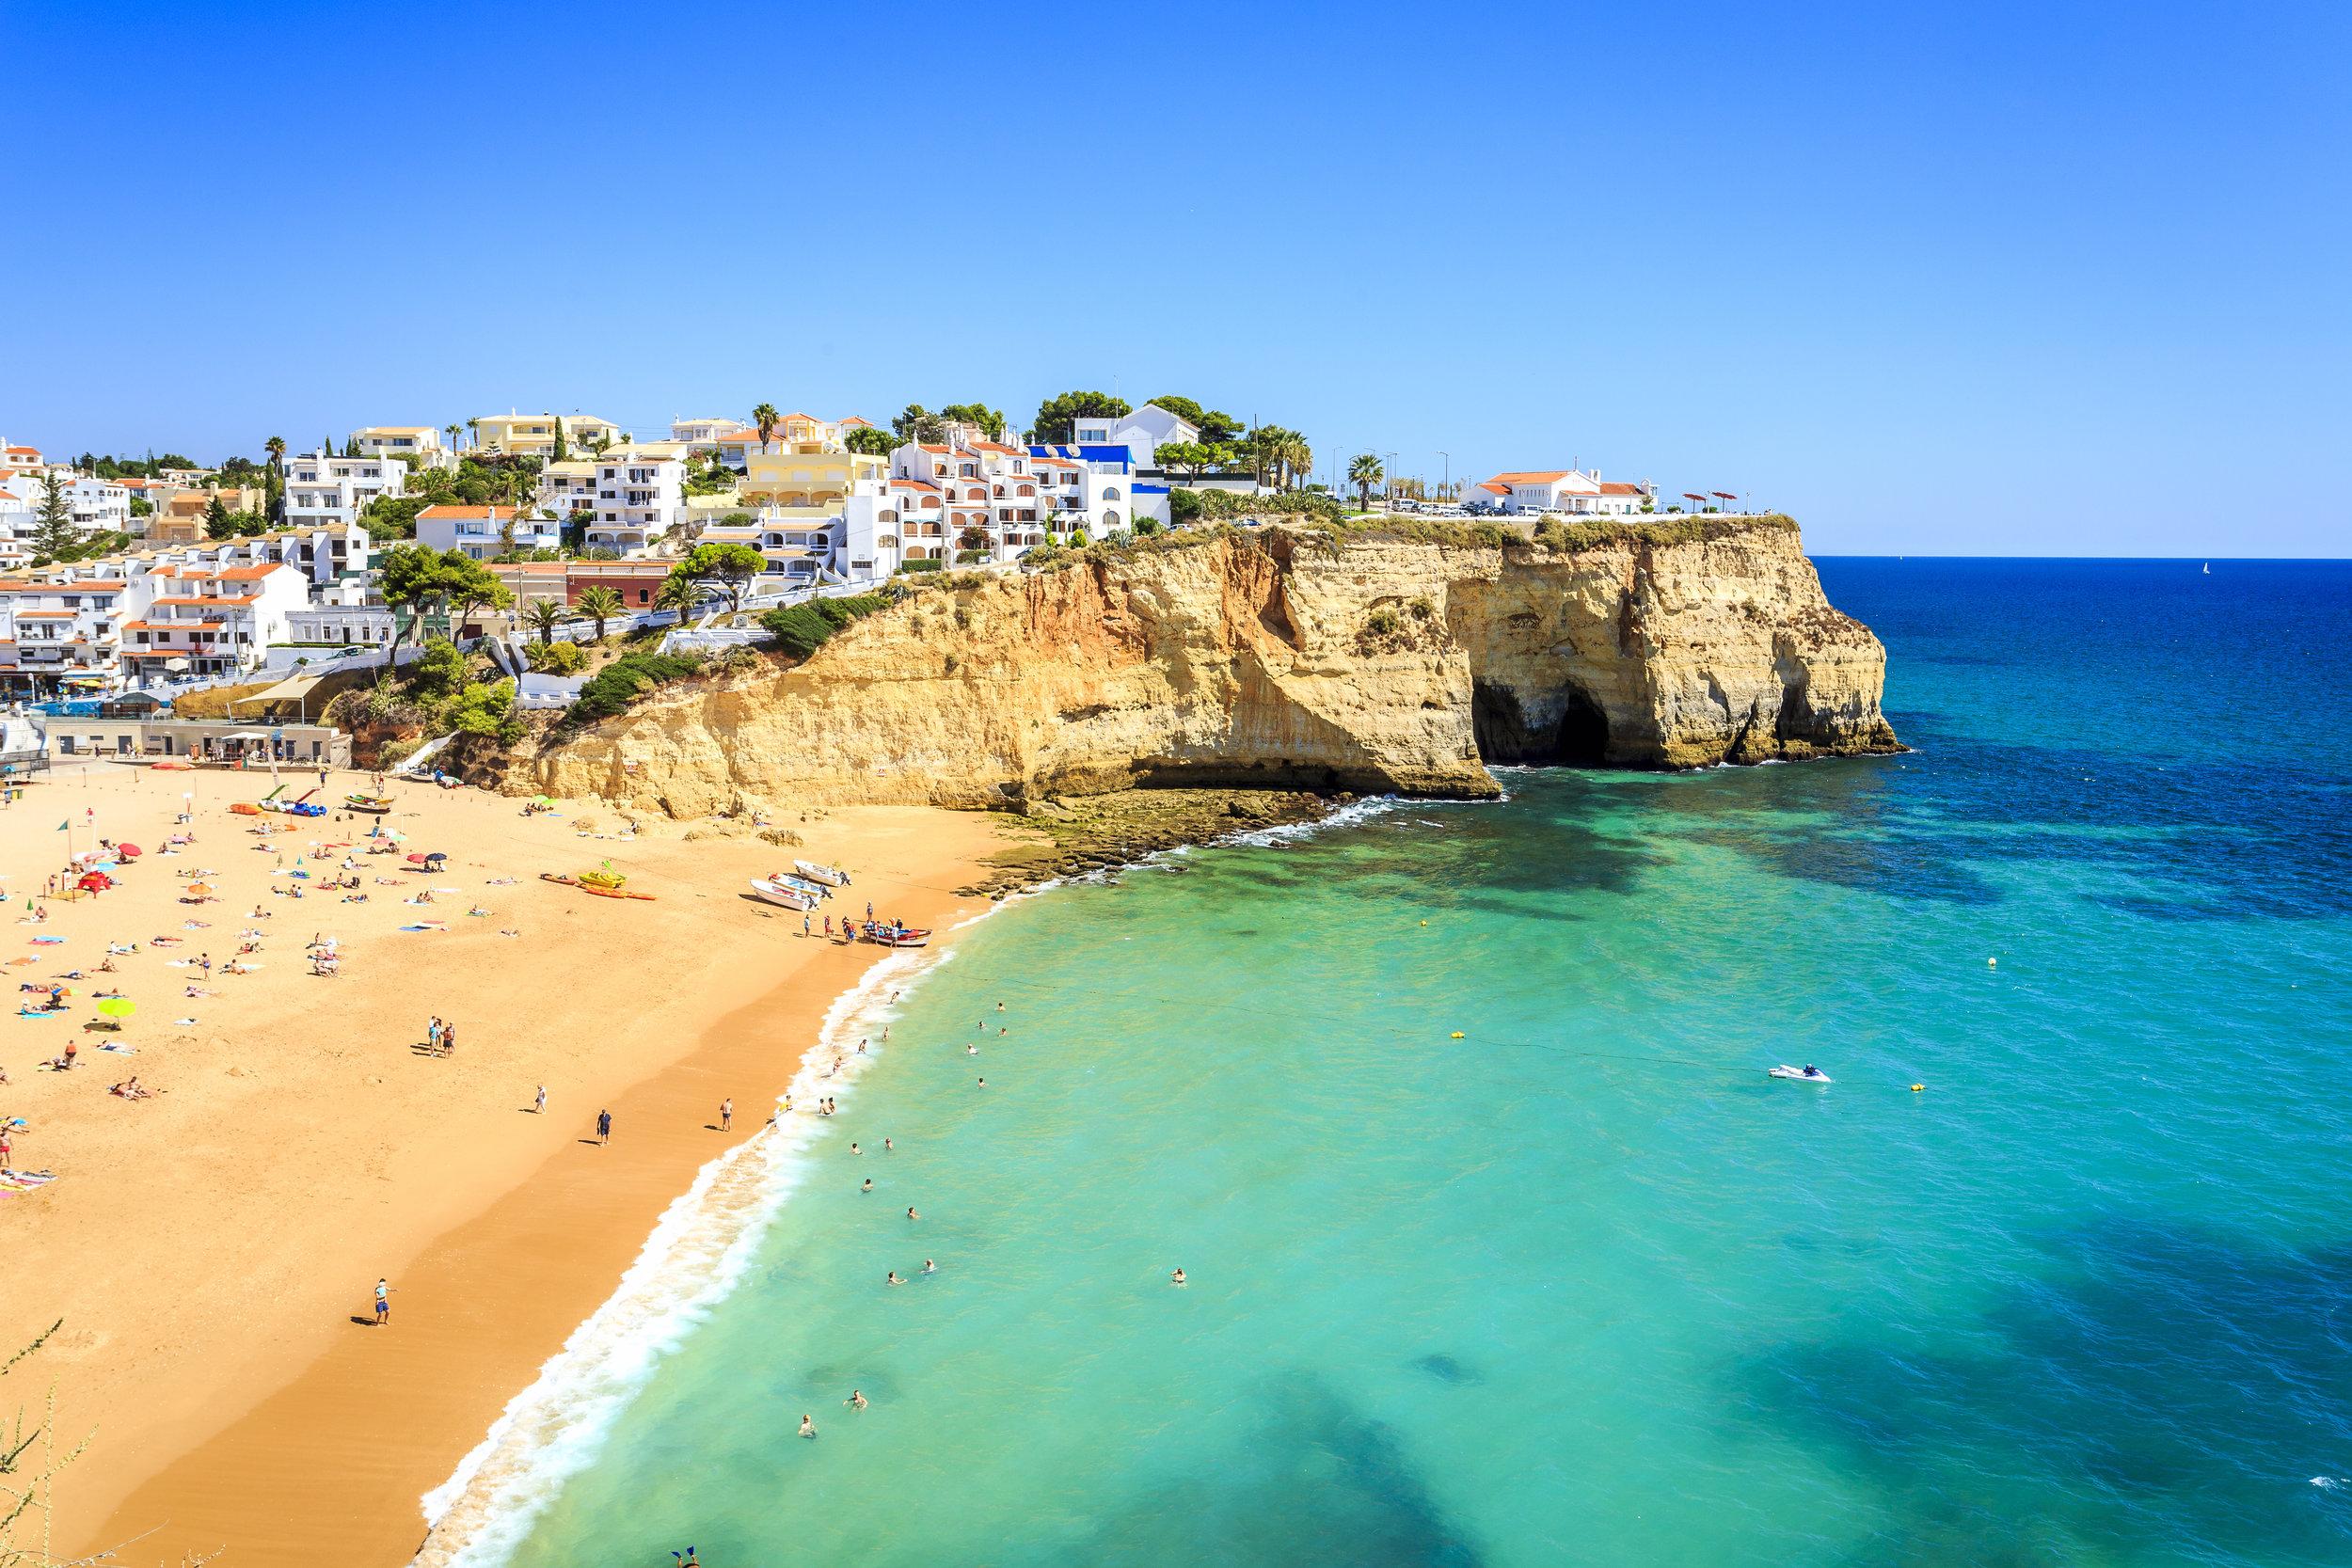 Beautiful-beach-in-Carvoeiro,-Algarve,-Portugal-621695504_5660x3773.jpeg